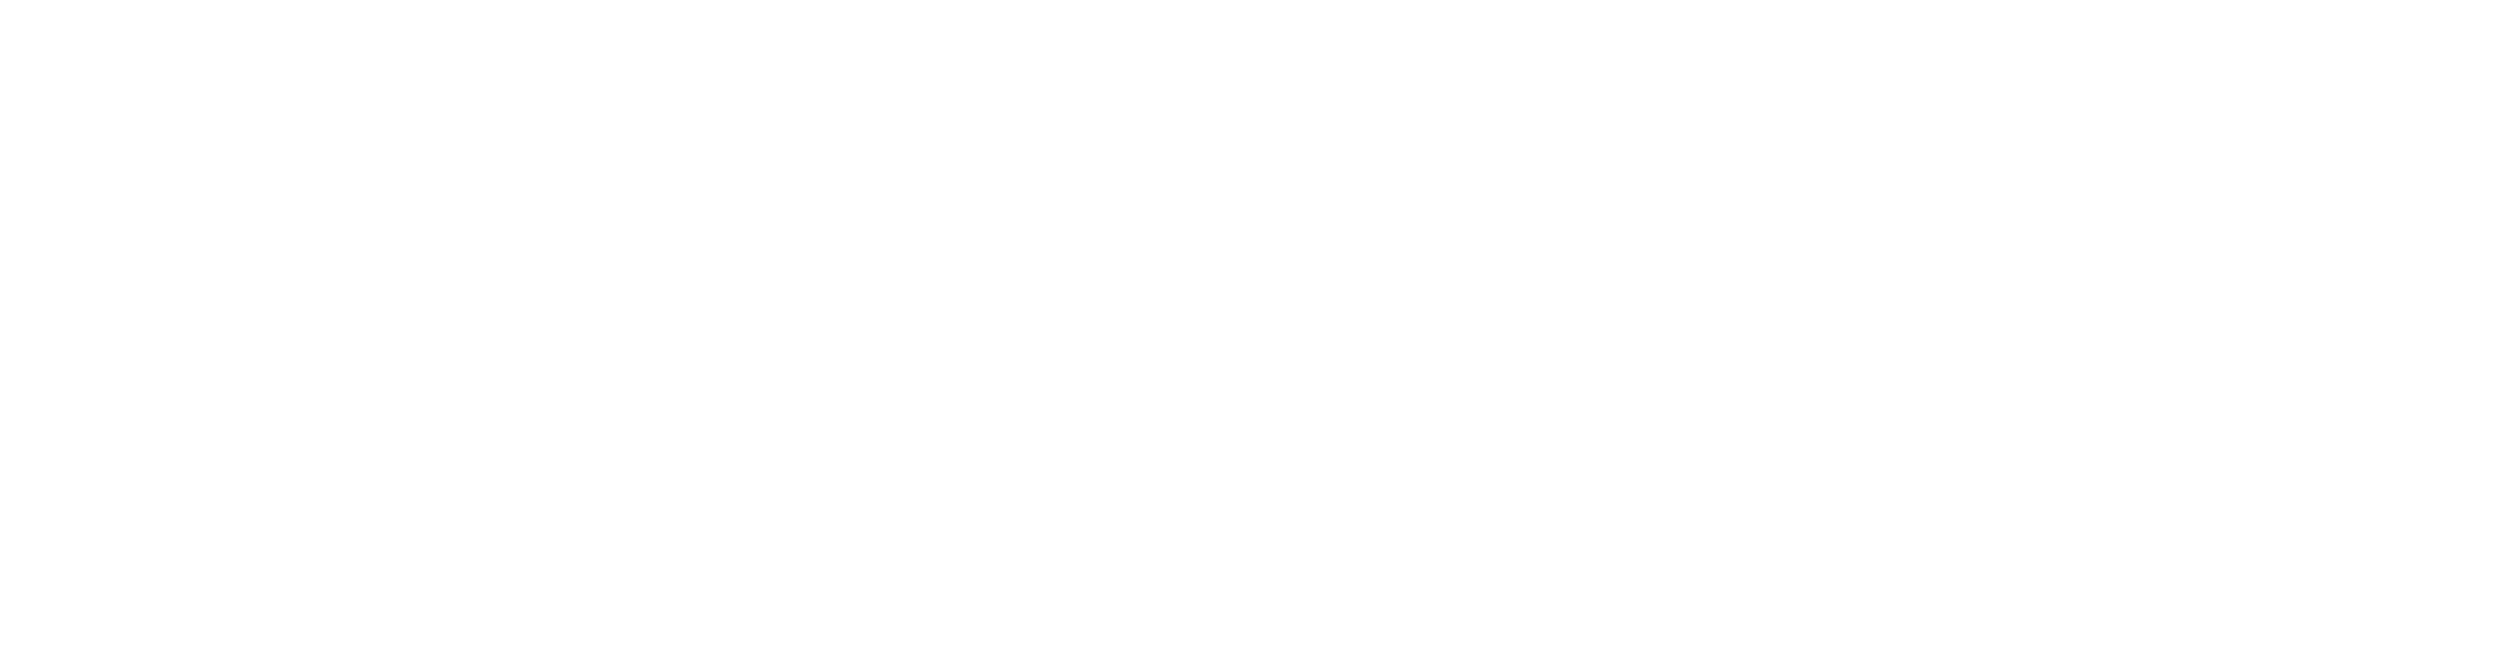 victoria-arduino1.png